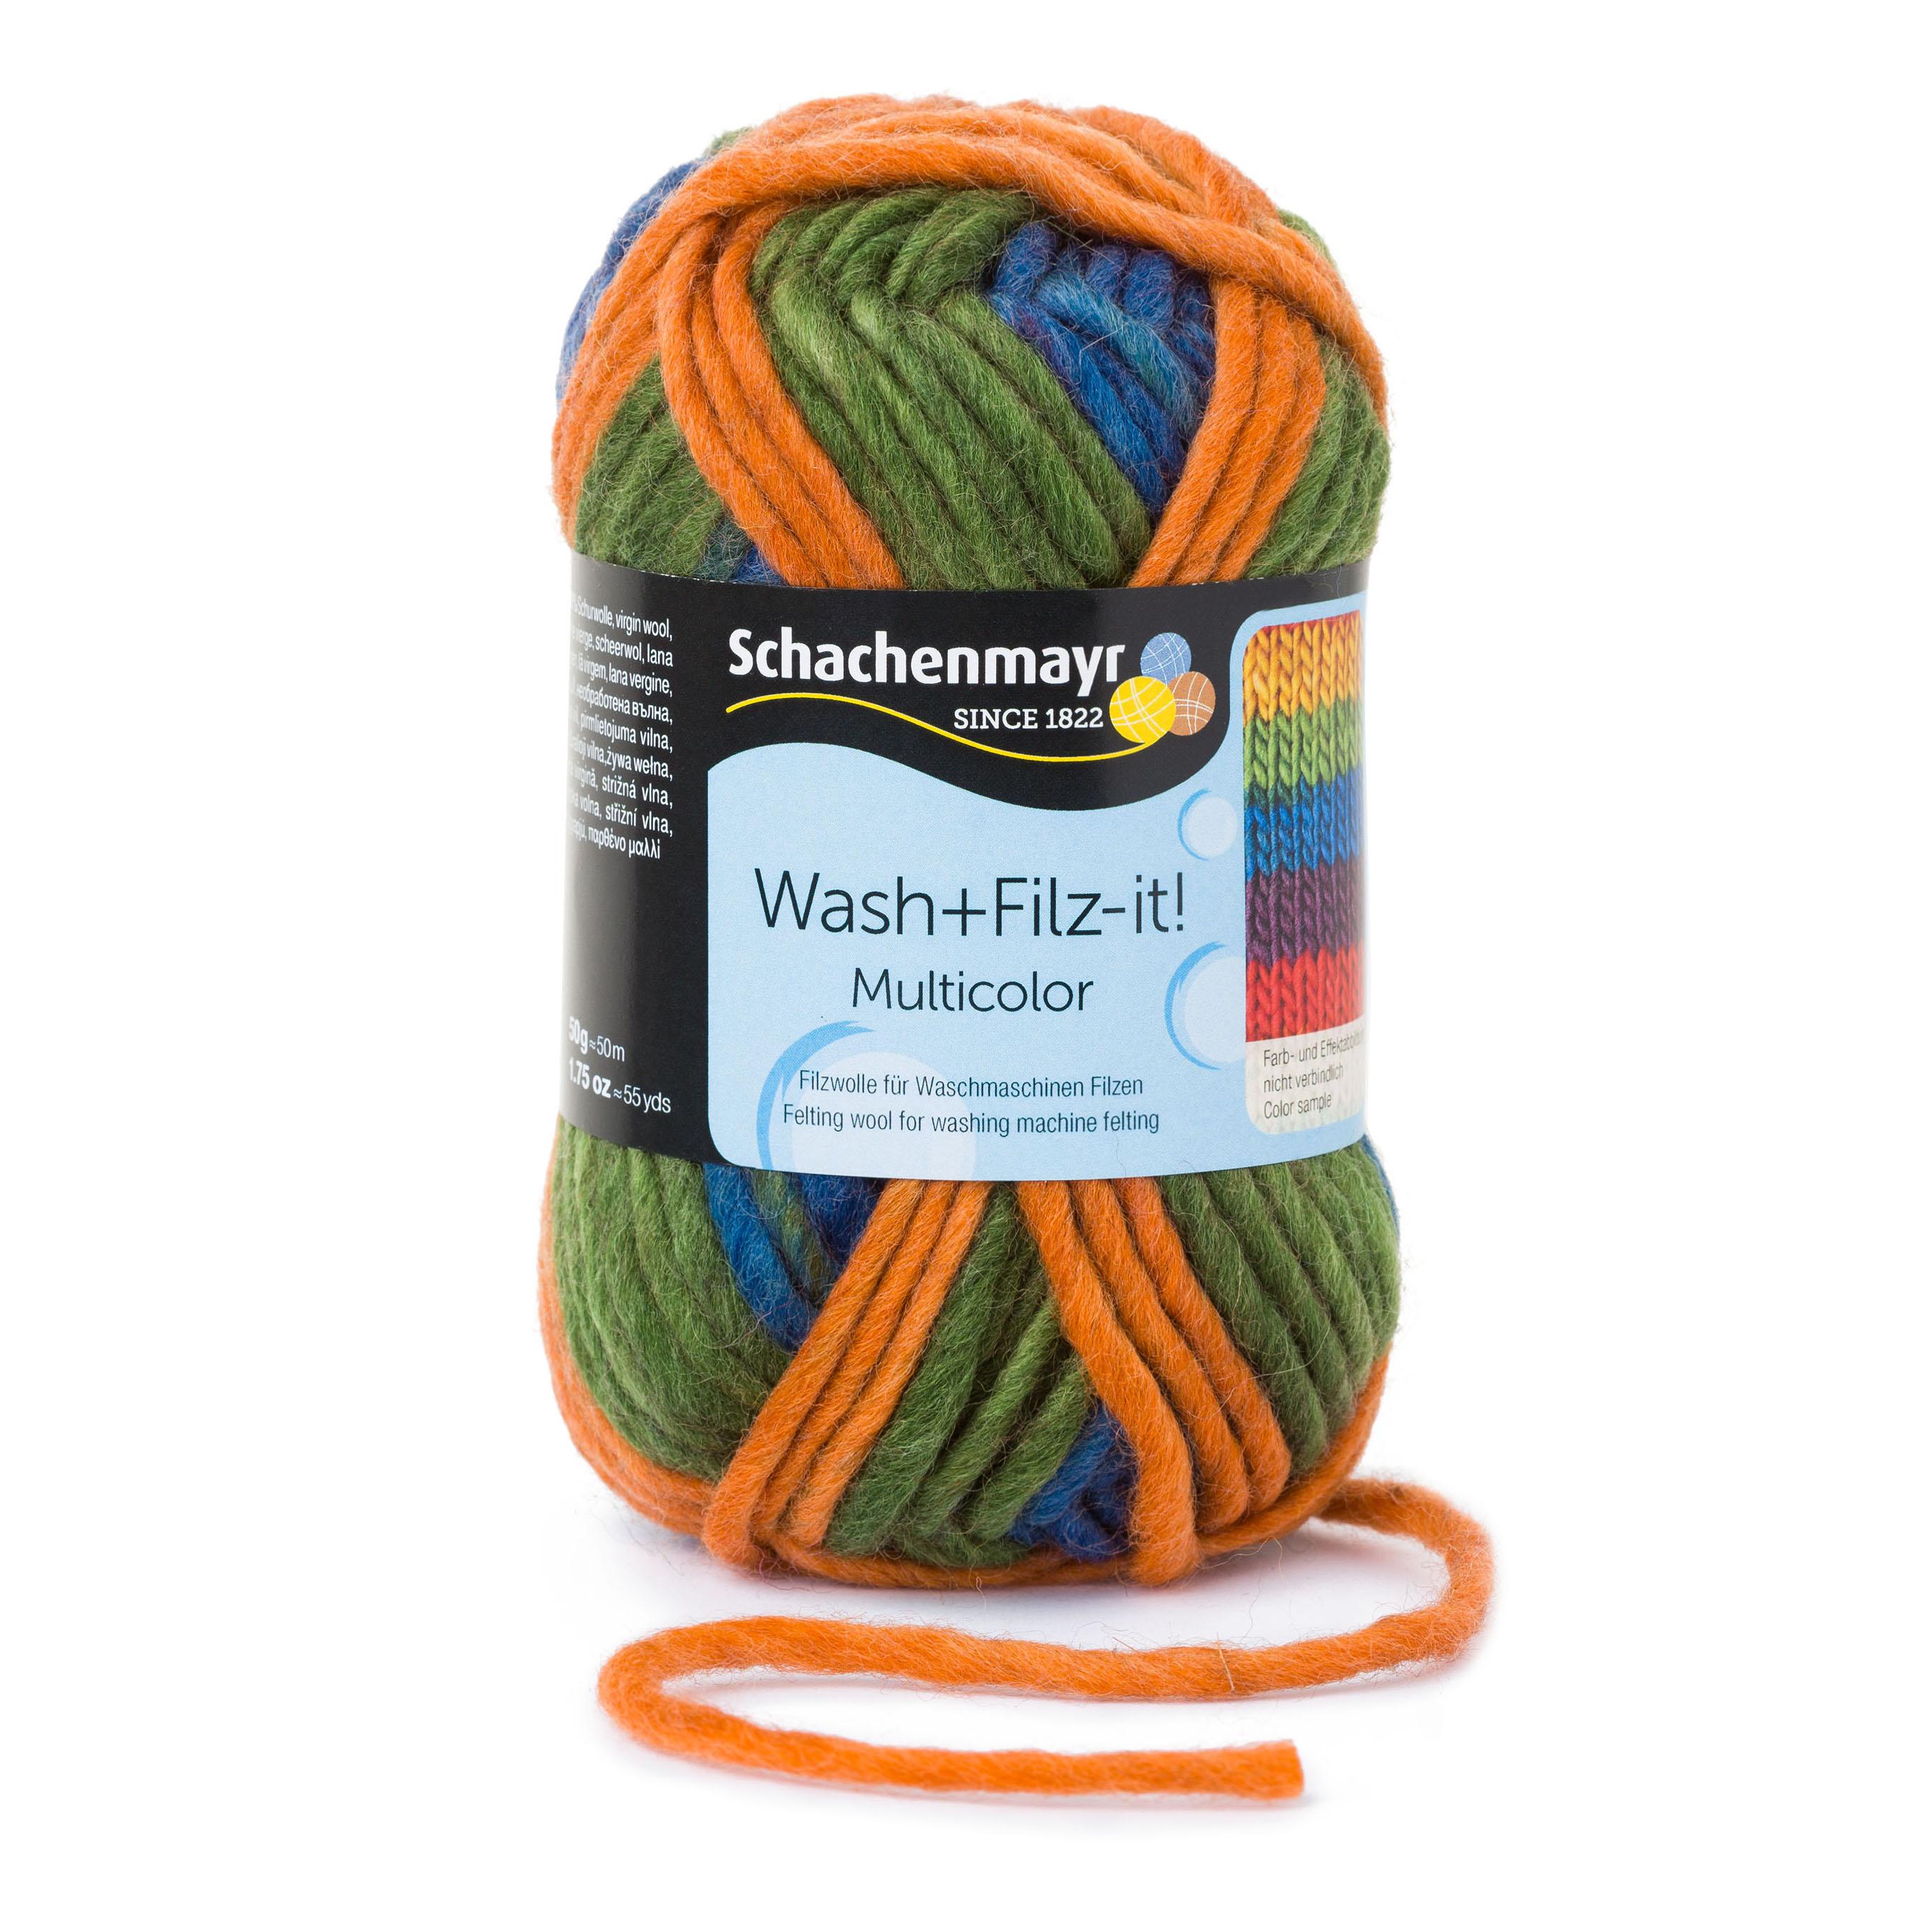 wash filz it multicolor stricken h keln wolle. Black Bedroom Furniture Sets. Home Design Ideas